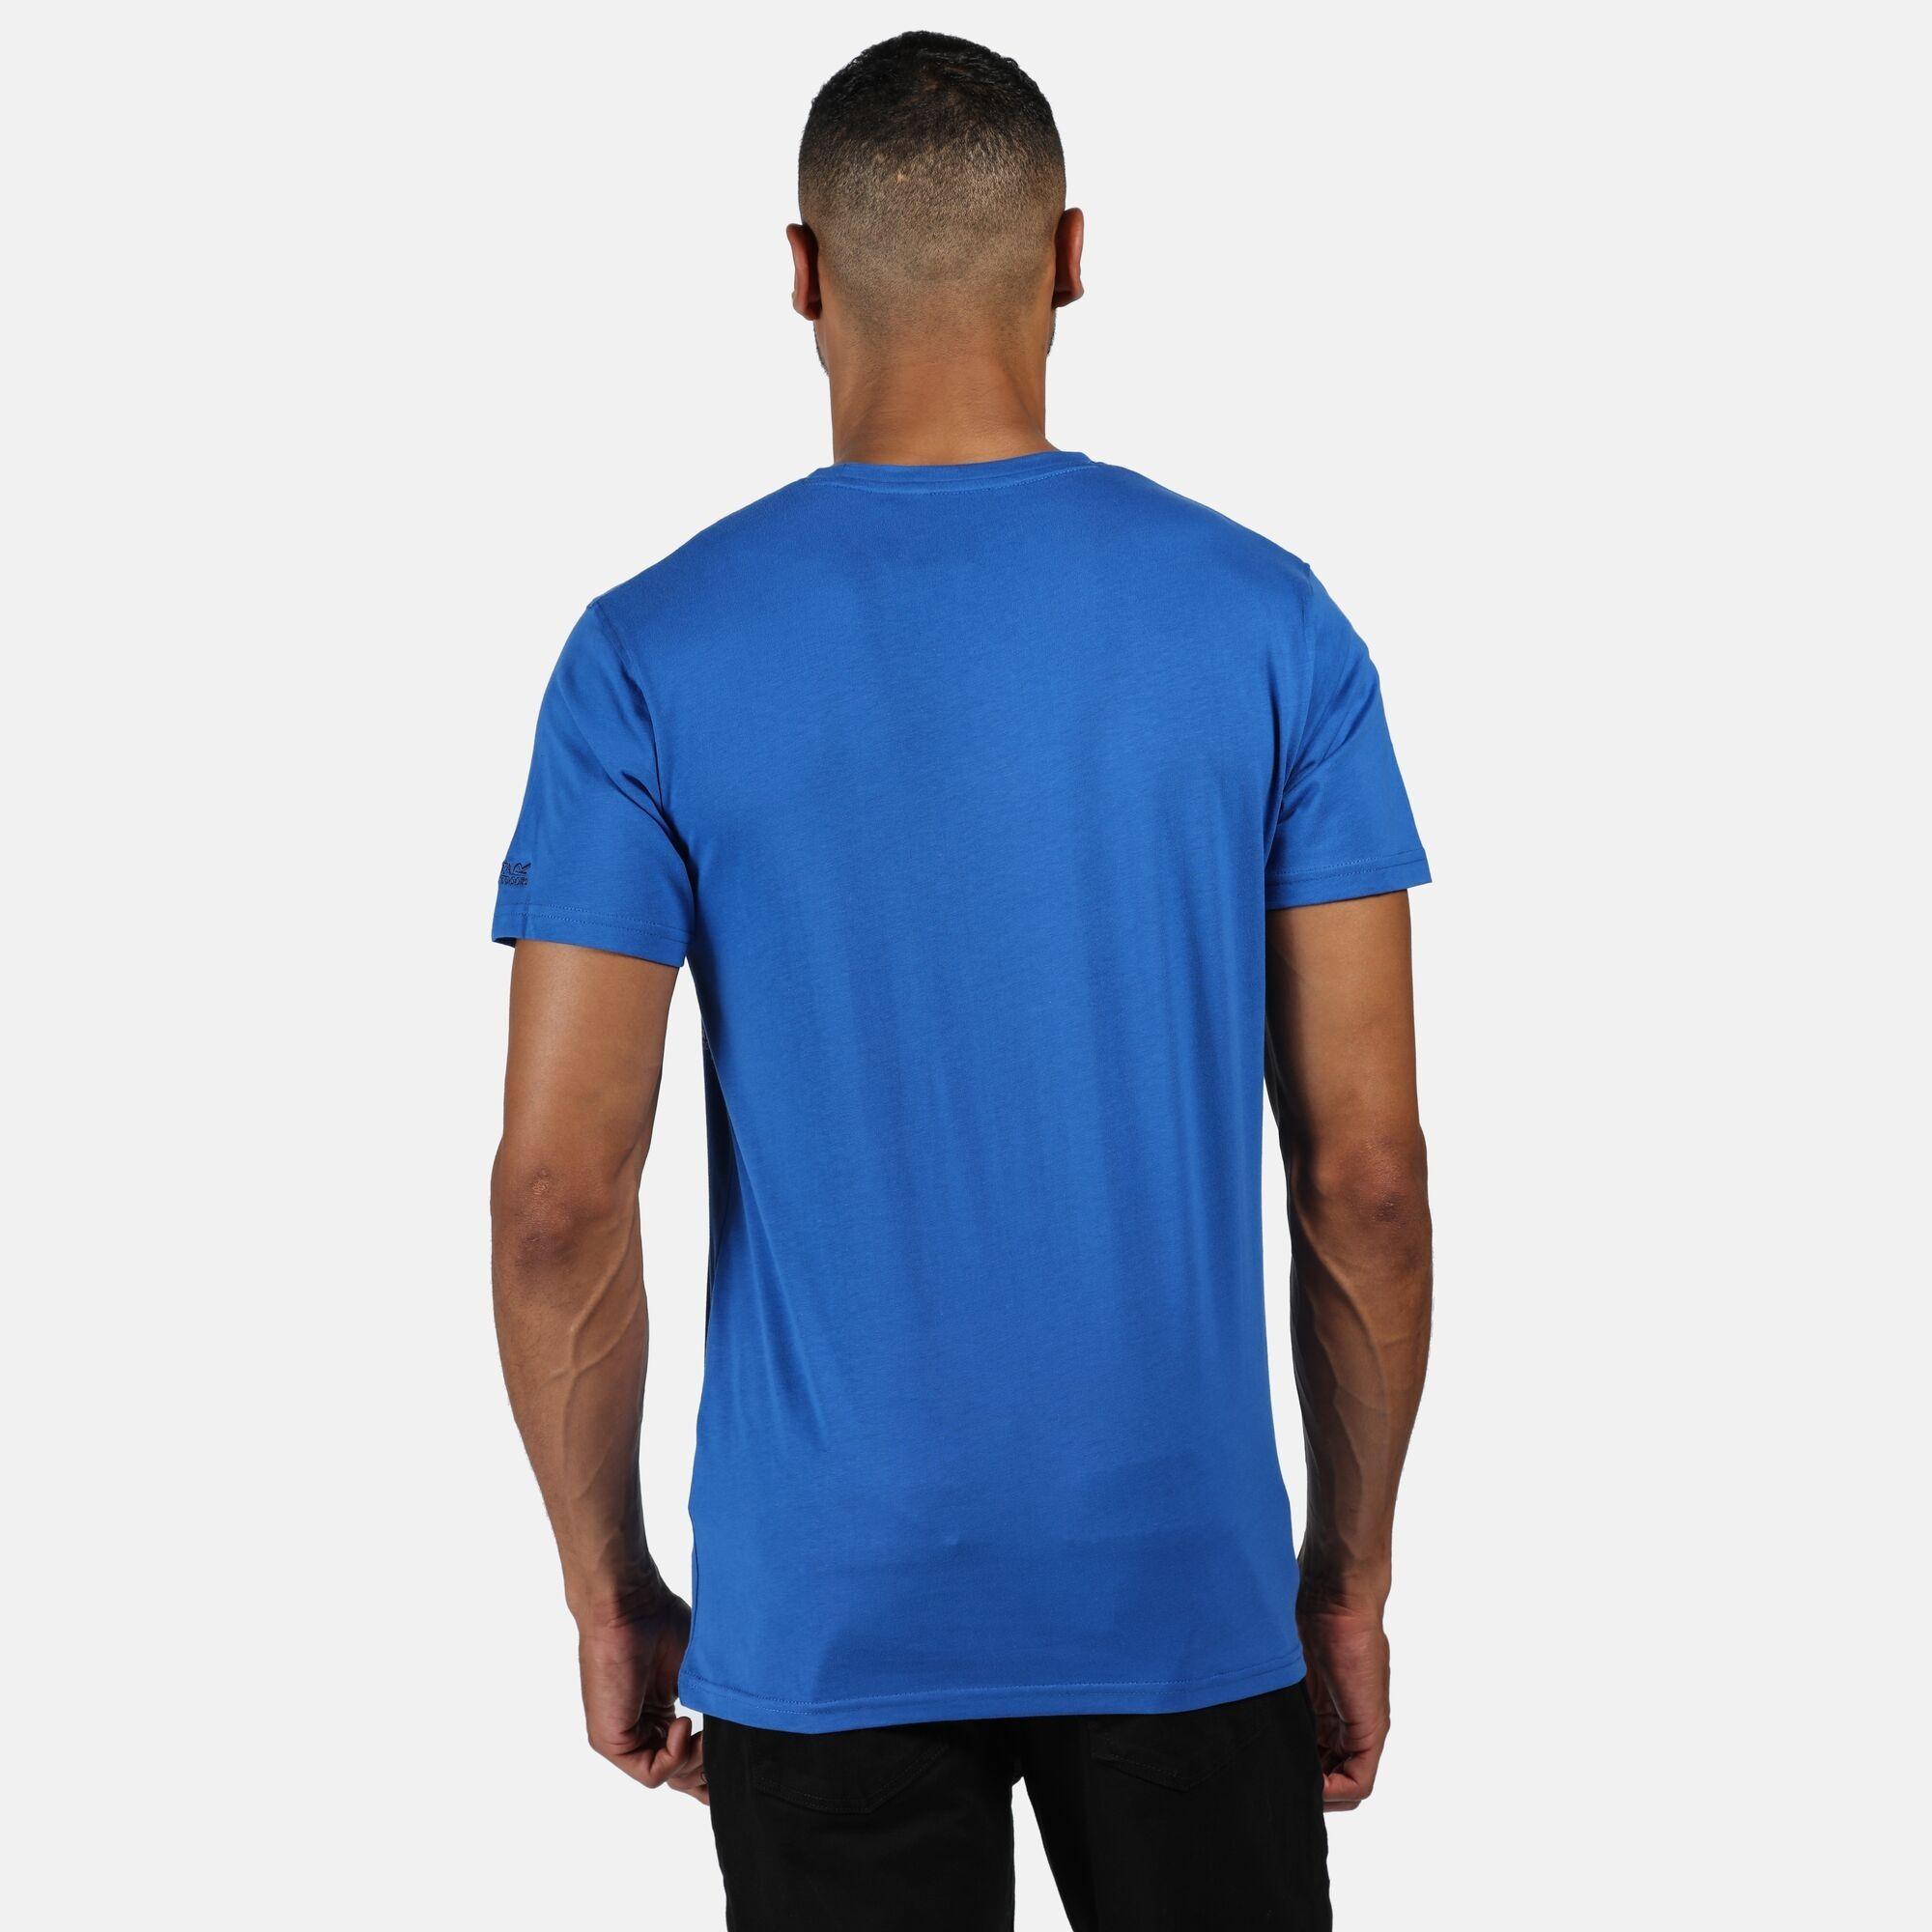 Regatta Mens Cline IV Graphic T-Shirt